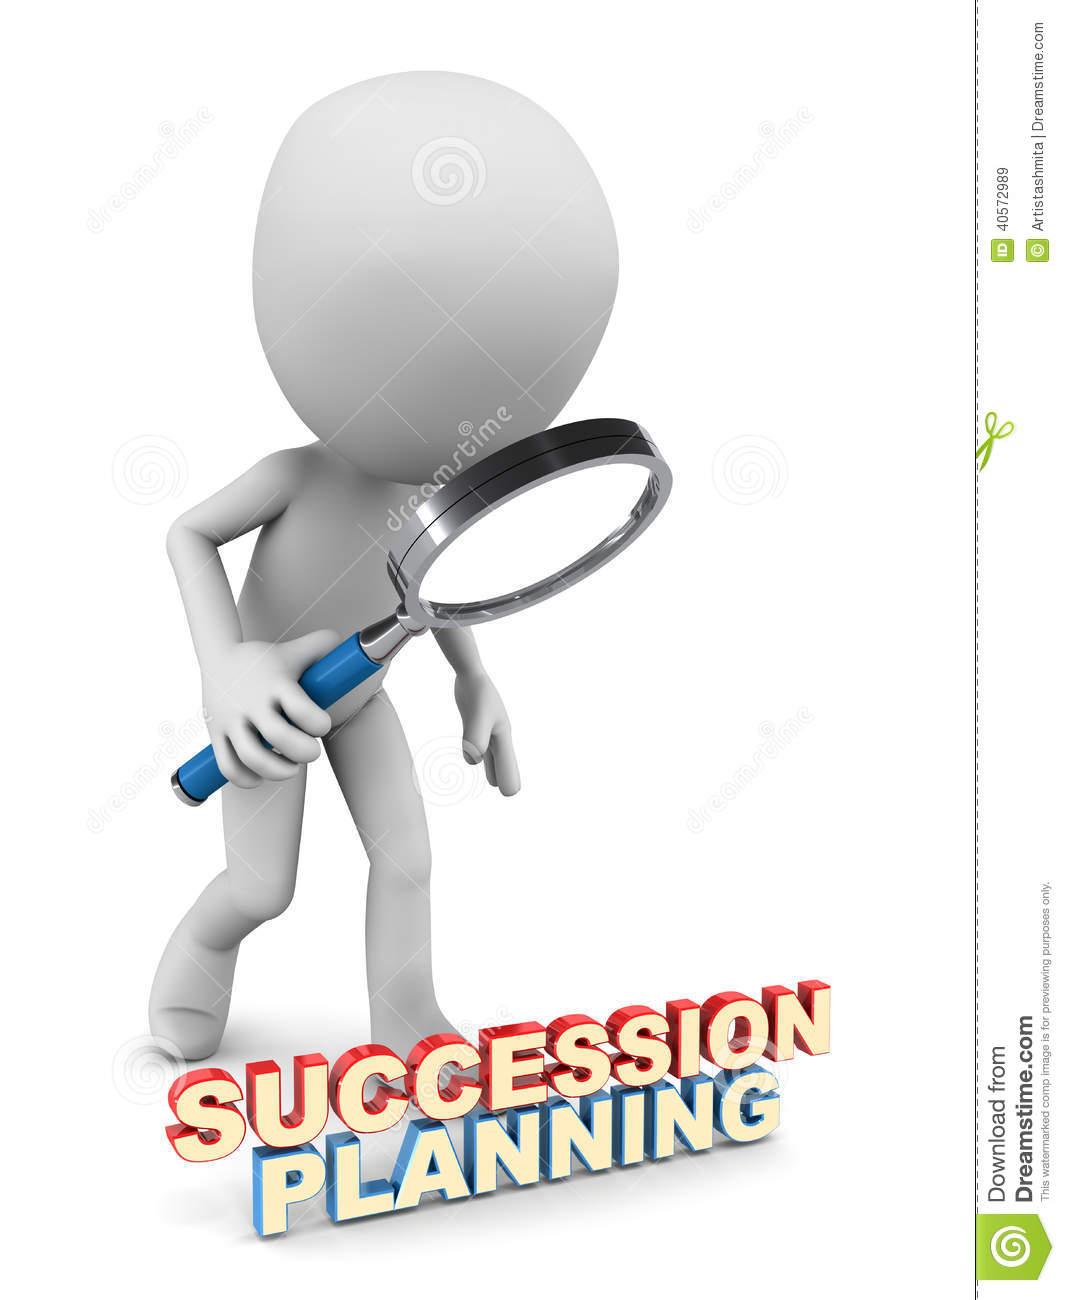 Succession Planning Stock Illustration.